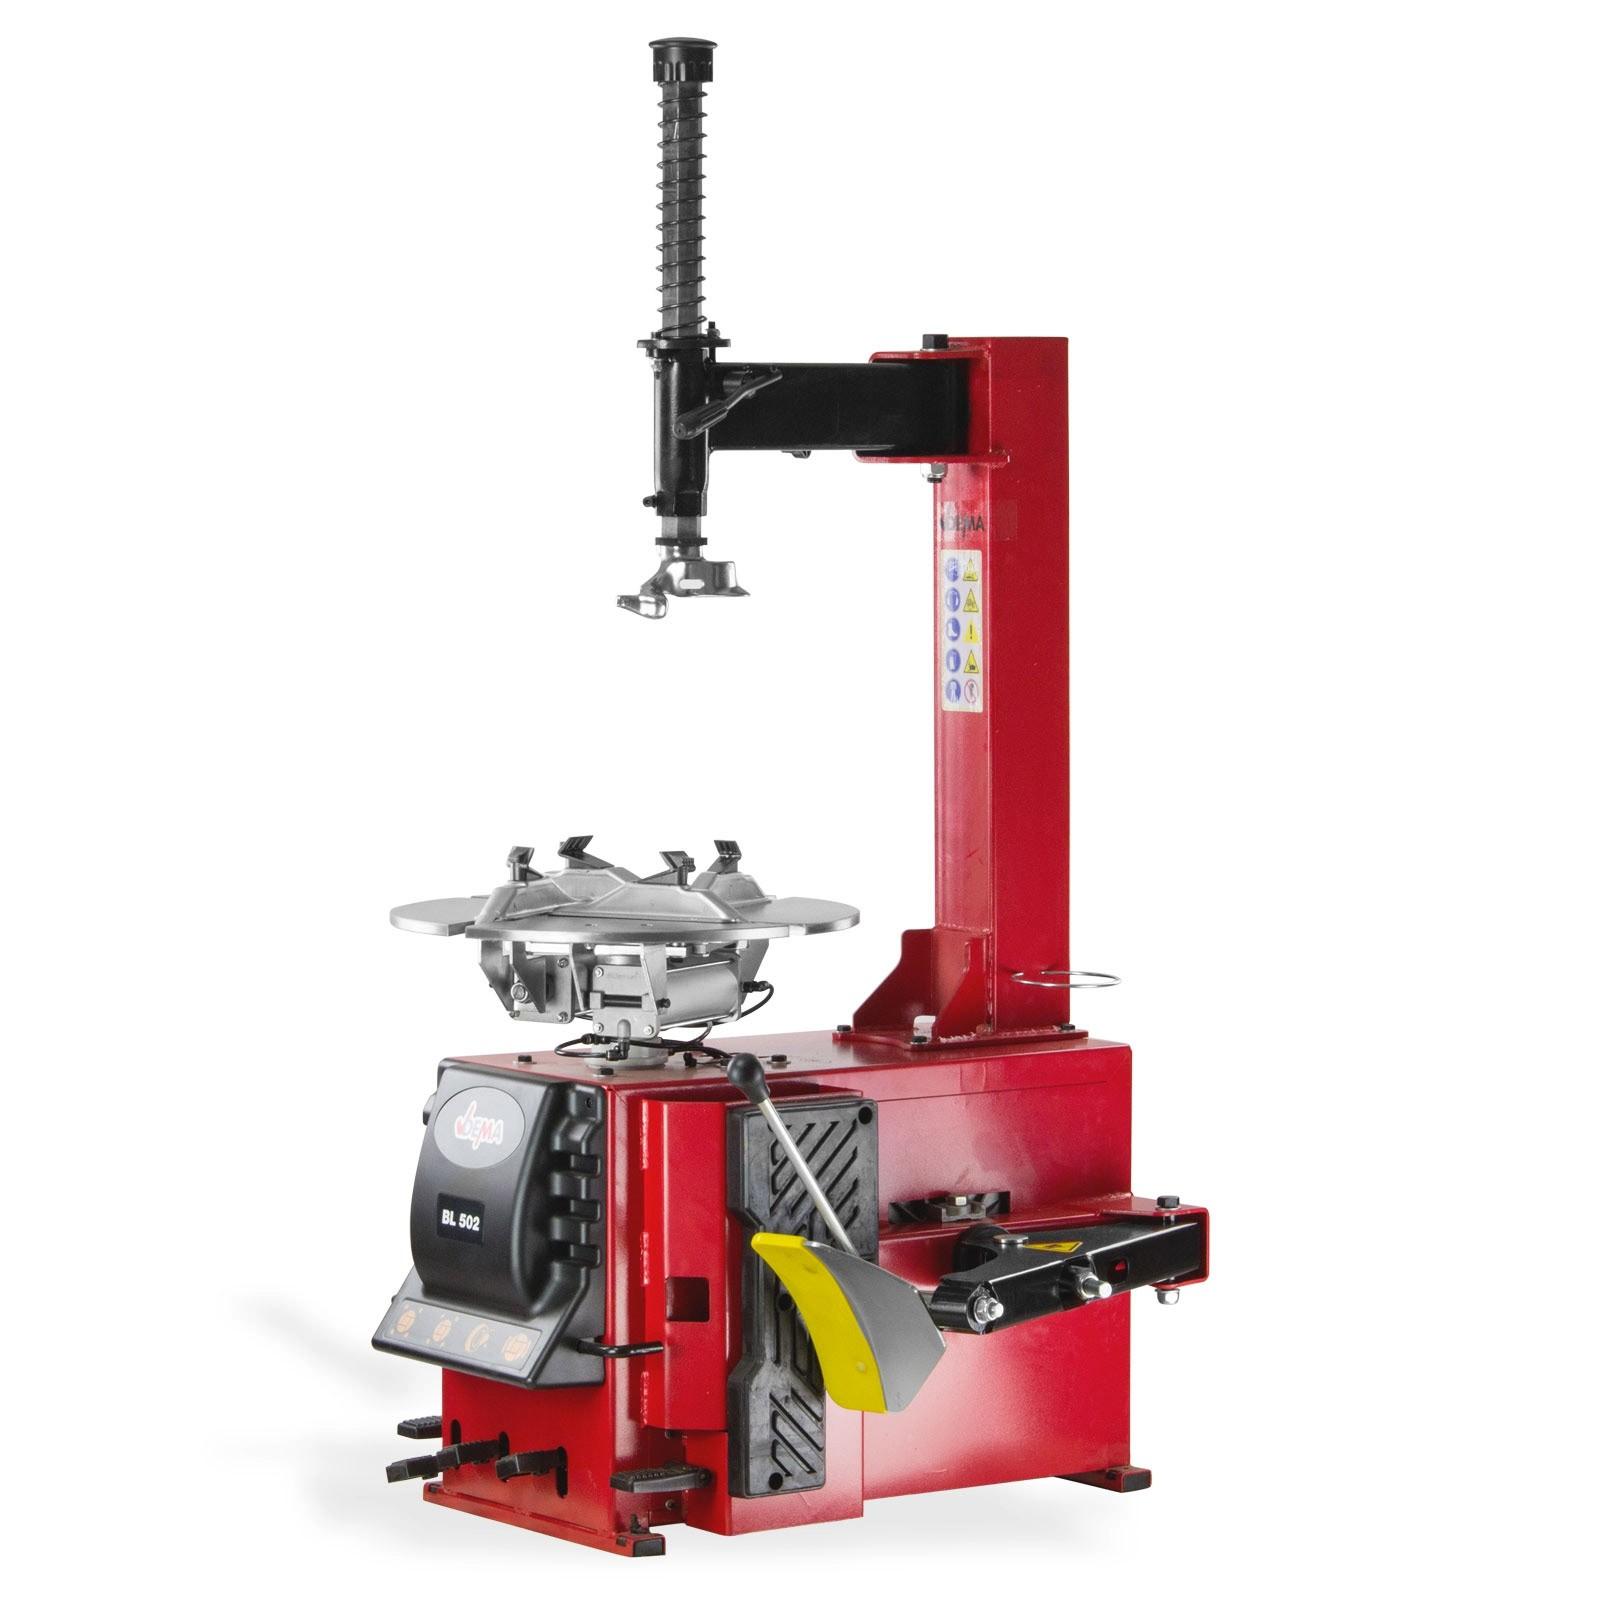 Dema Profi Reifenmontiermaschine / Reifenmontiergerät BL 502 18021